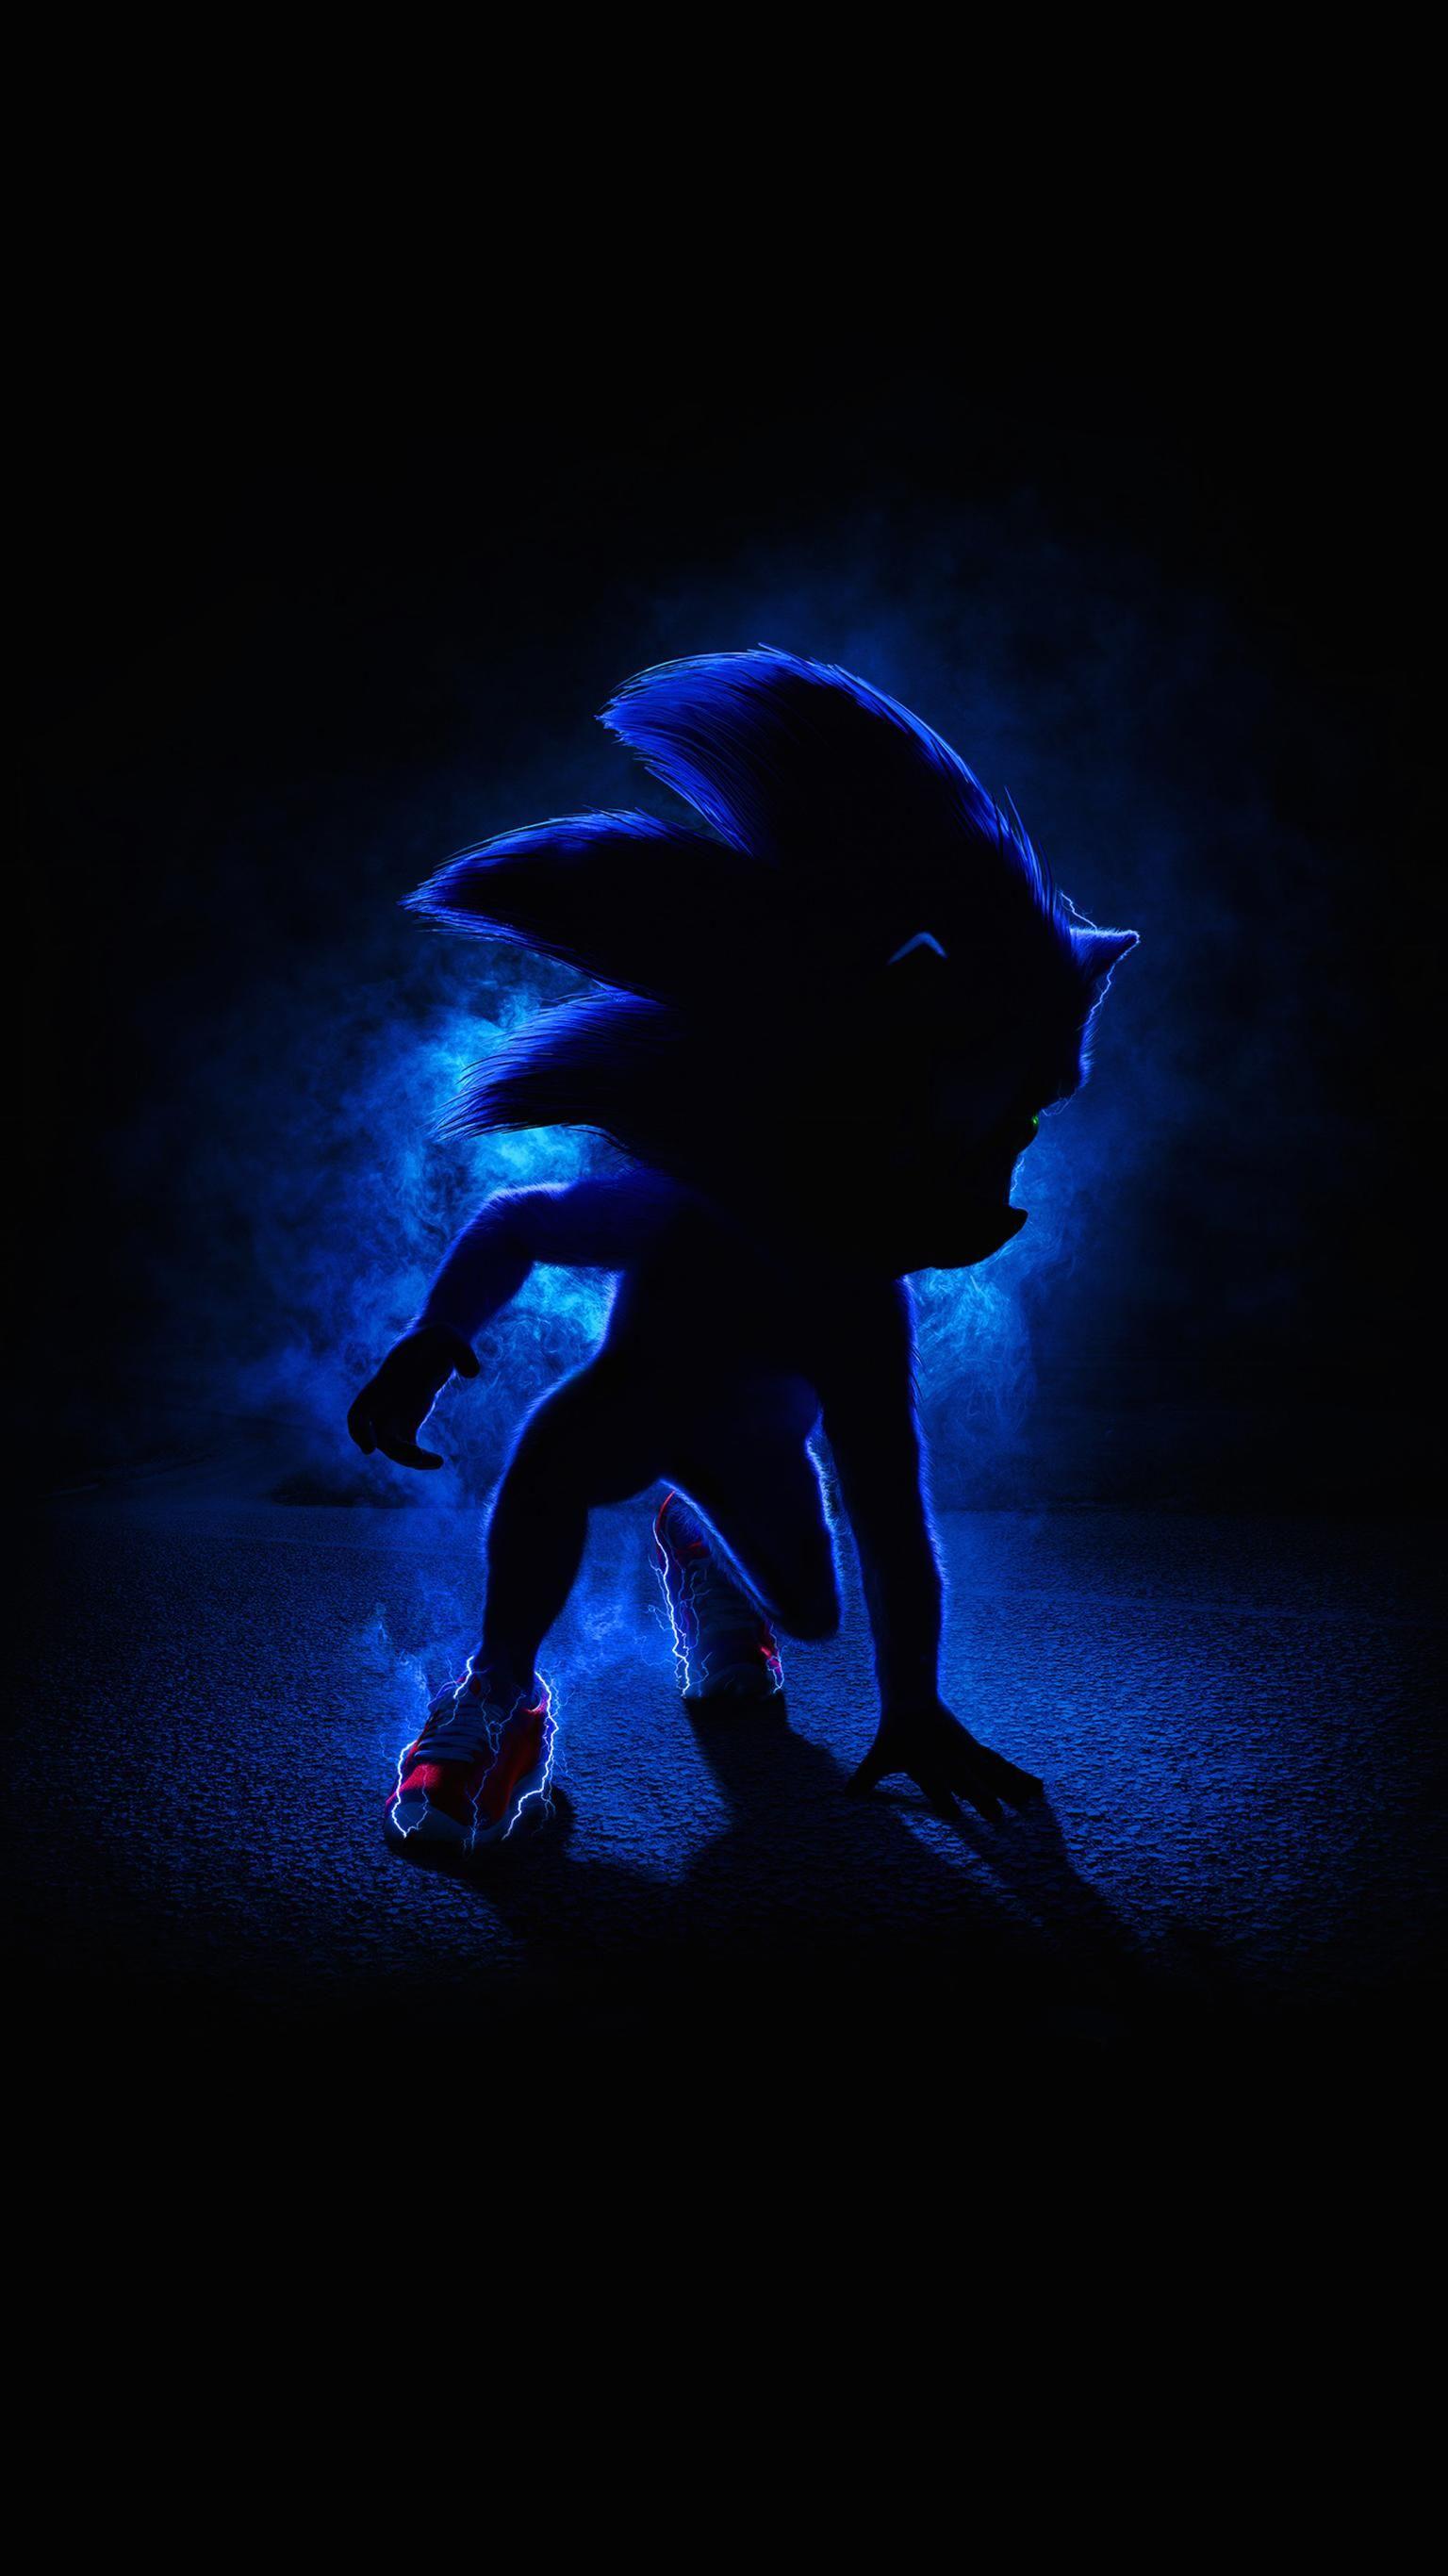 Sonic the Hedgehog 2020 Phone Wallpaper Hedgehog movie Sonic 1536x2732